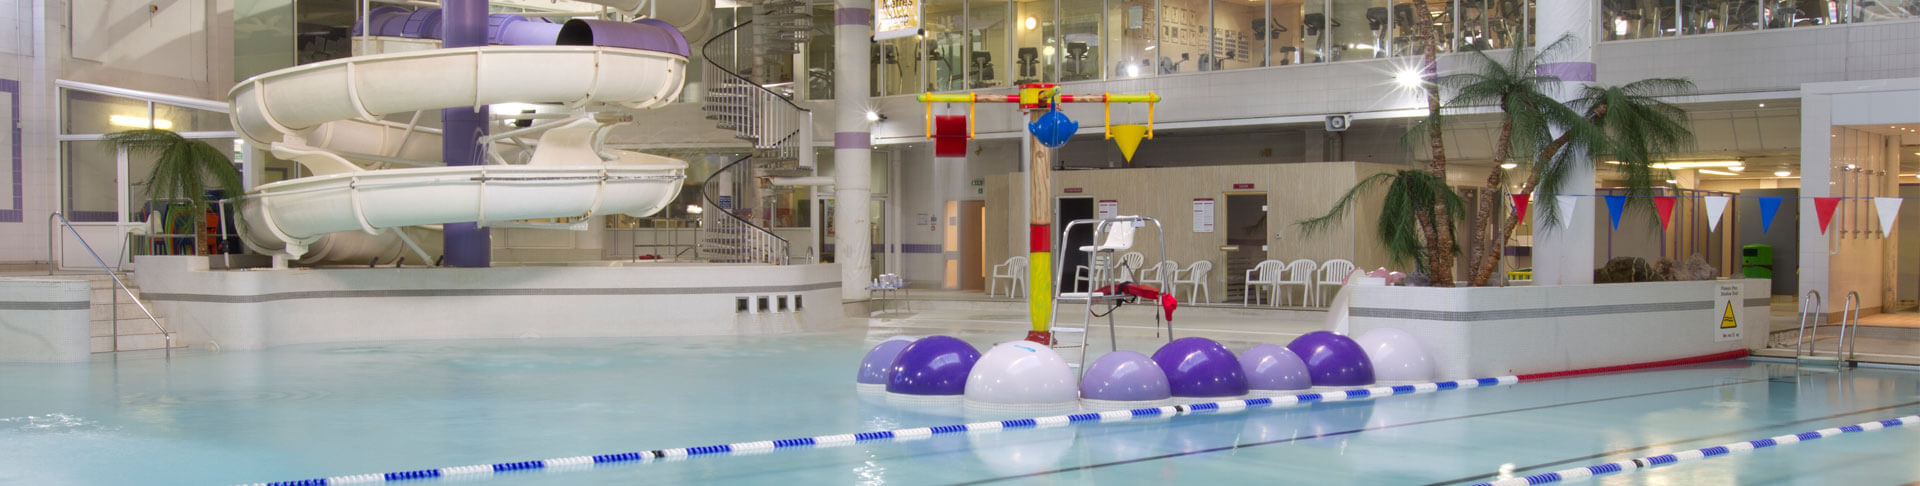 swimming at tandridge leisure centre